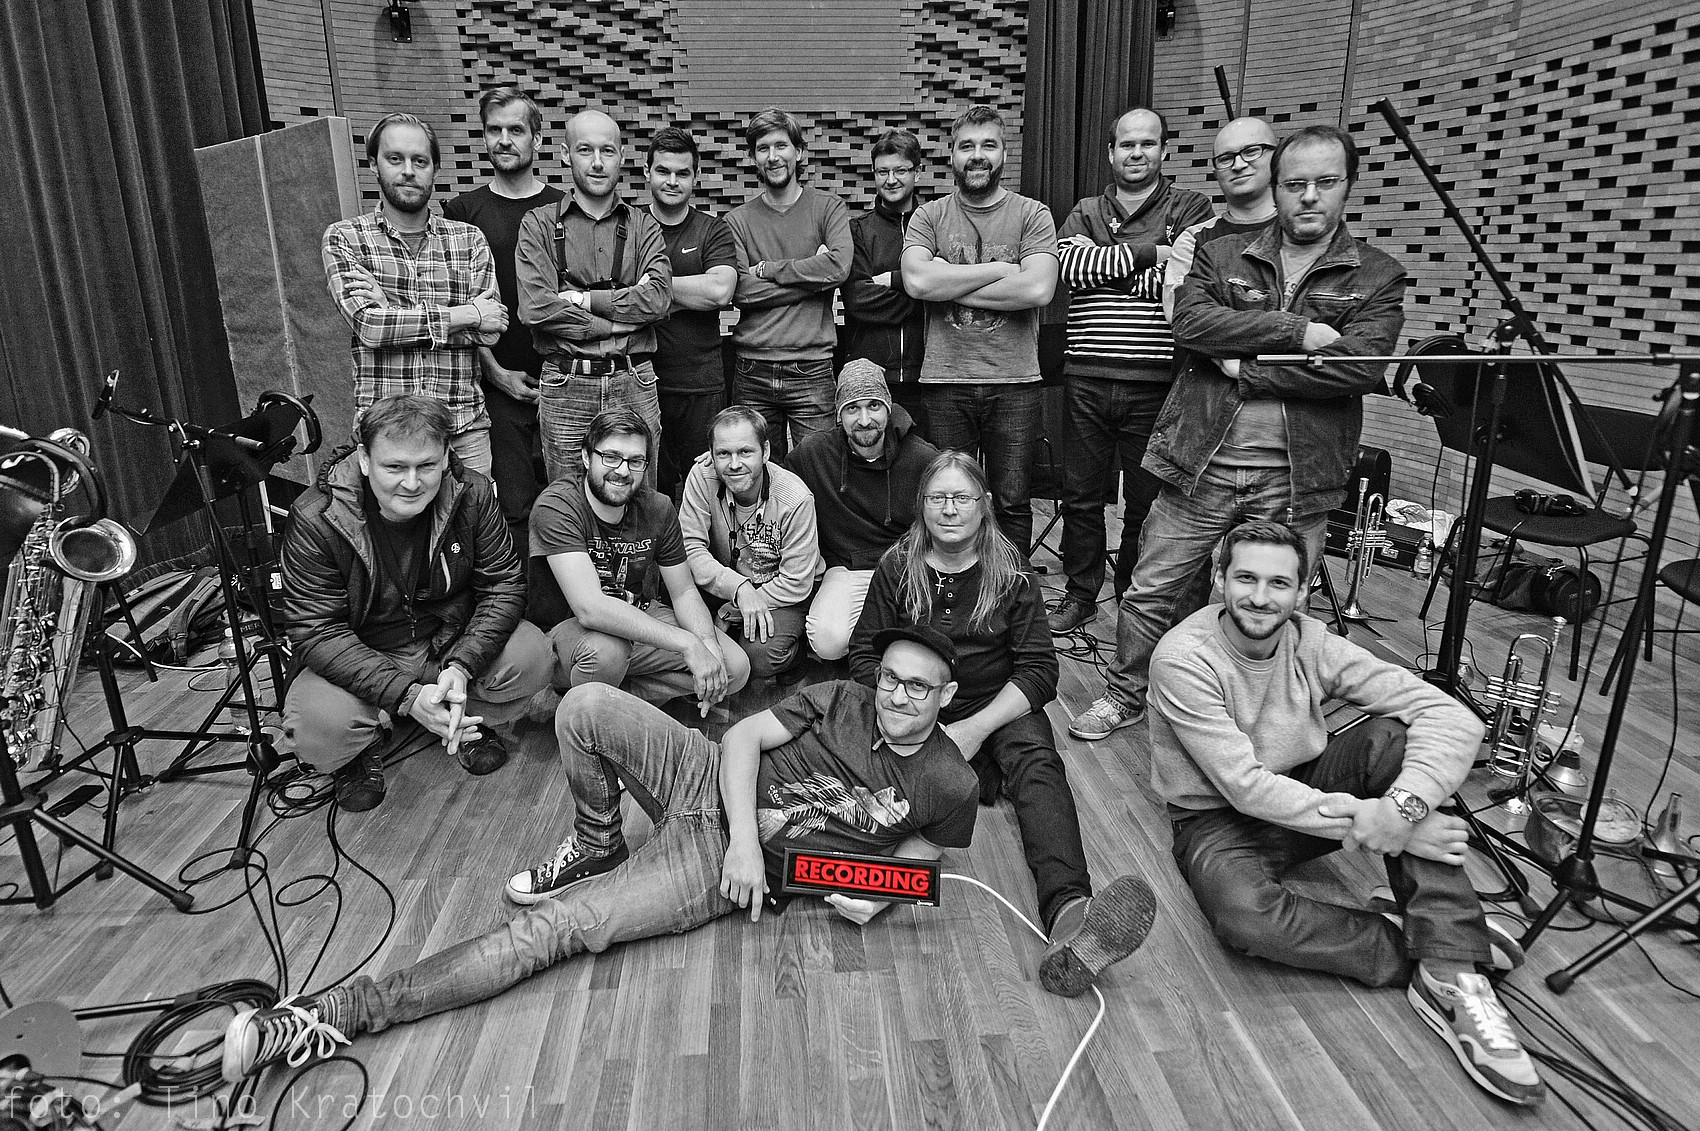 RECENZE: B-Side Band mapuje na desce